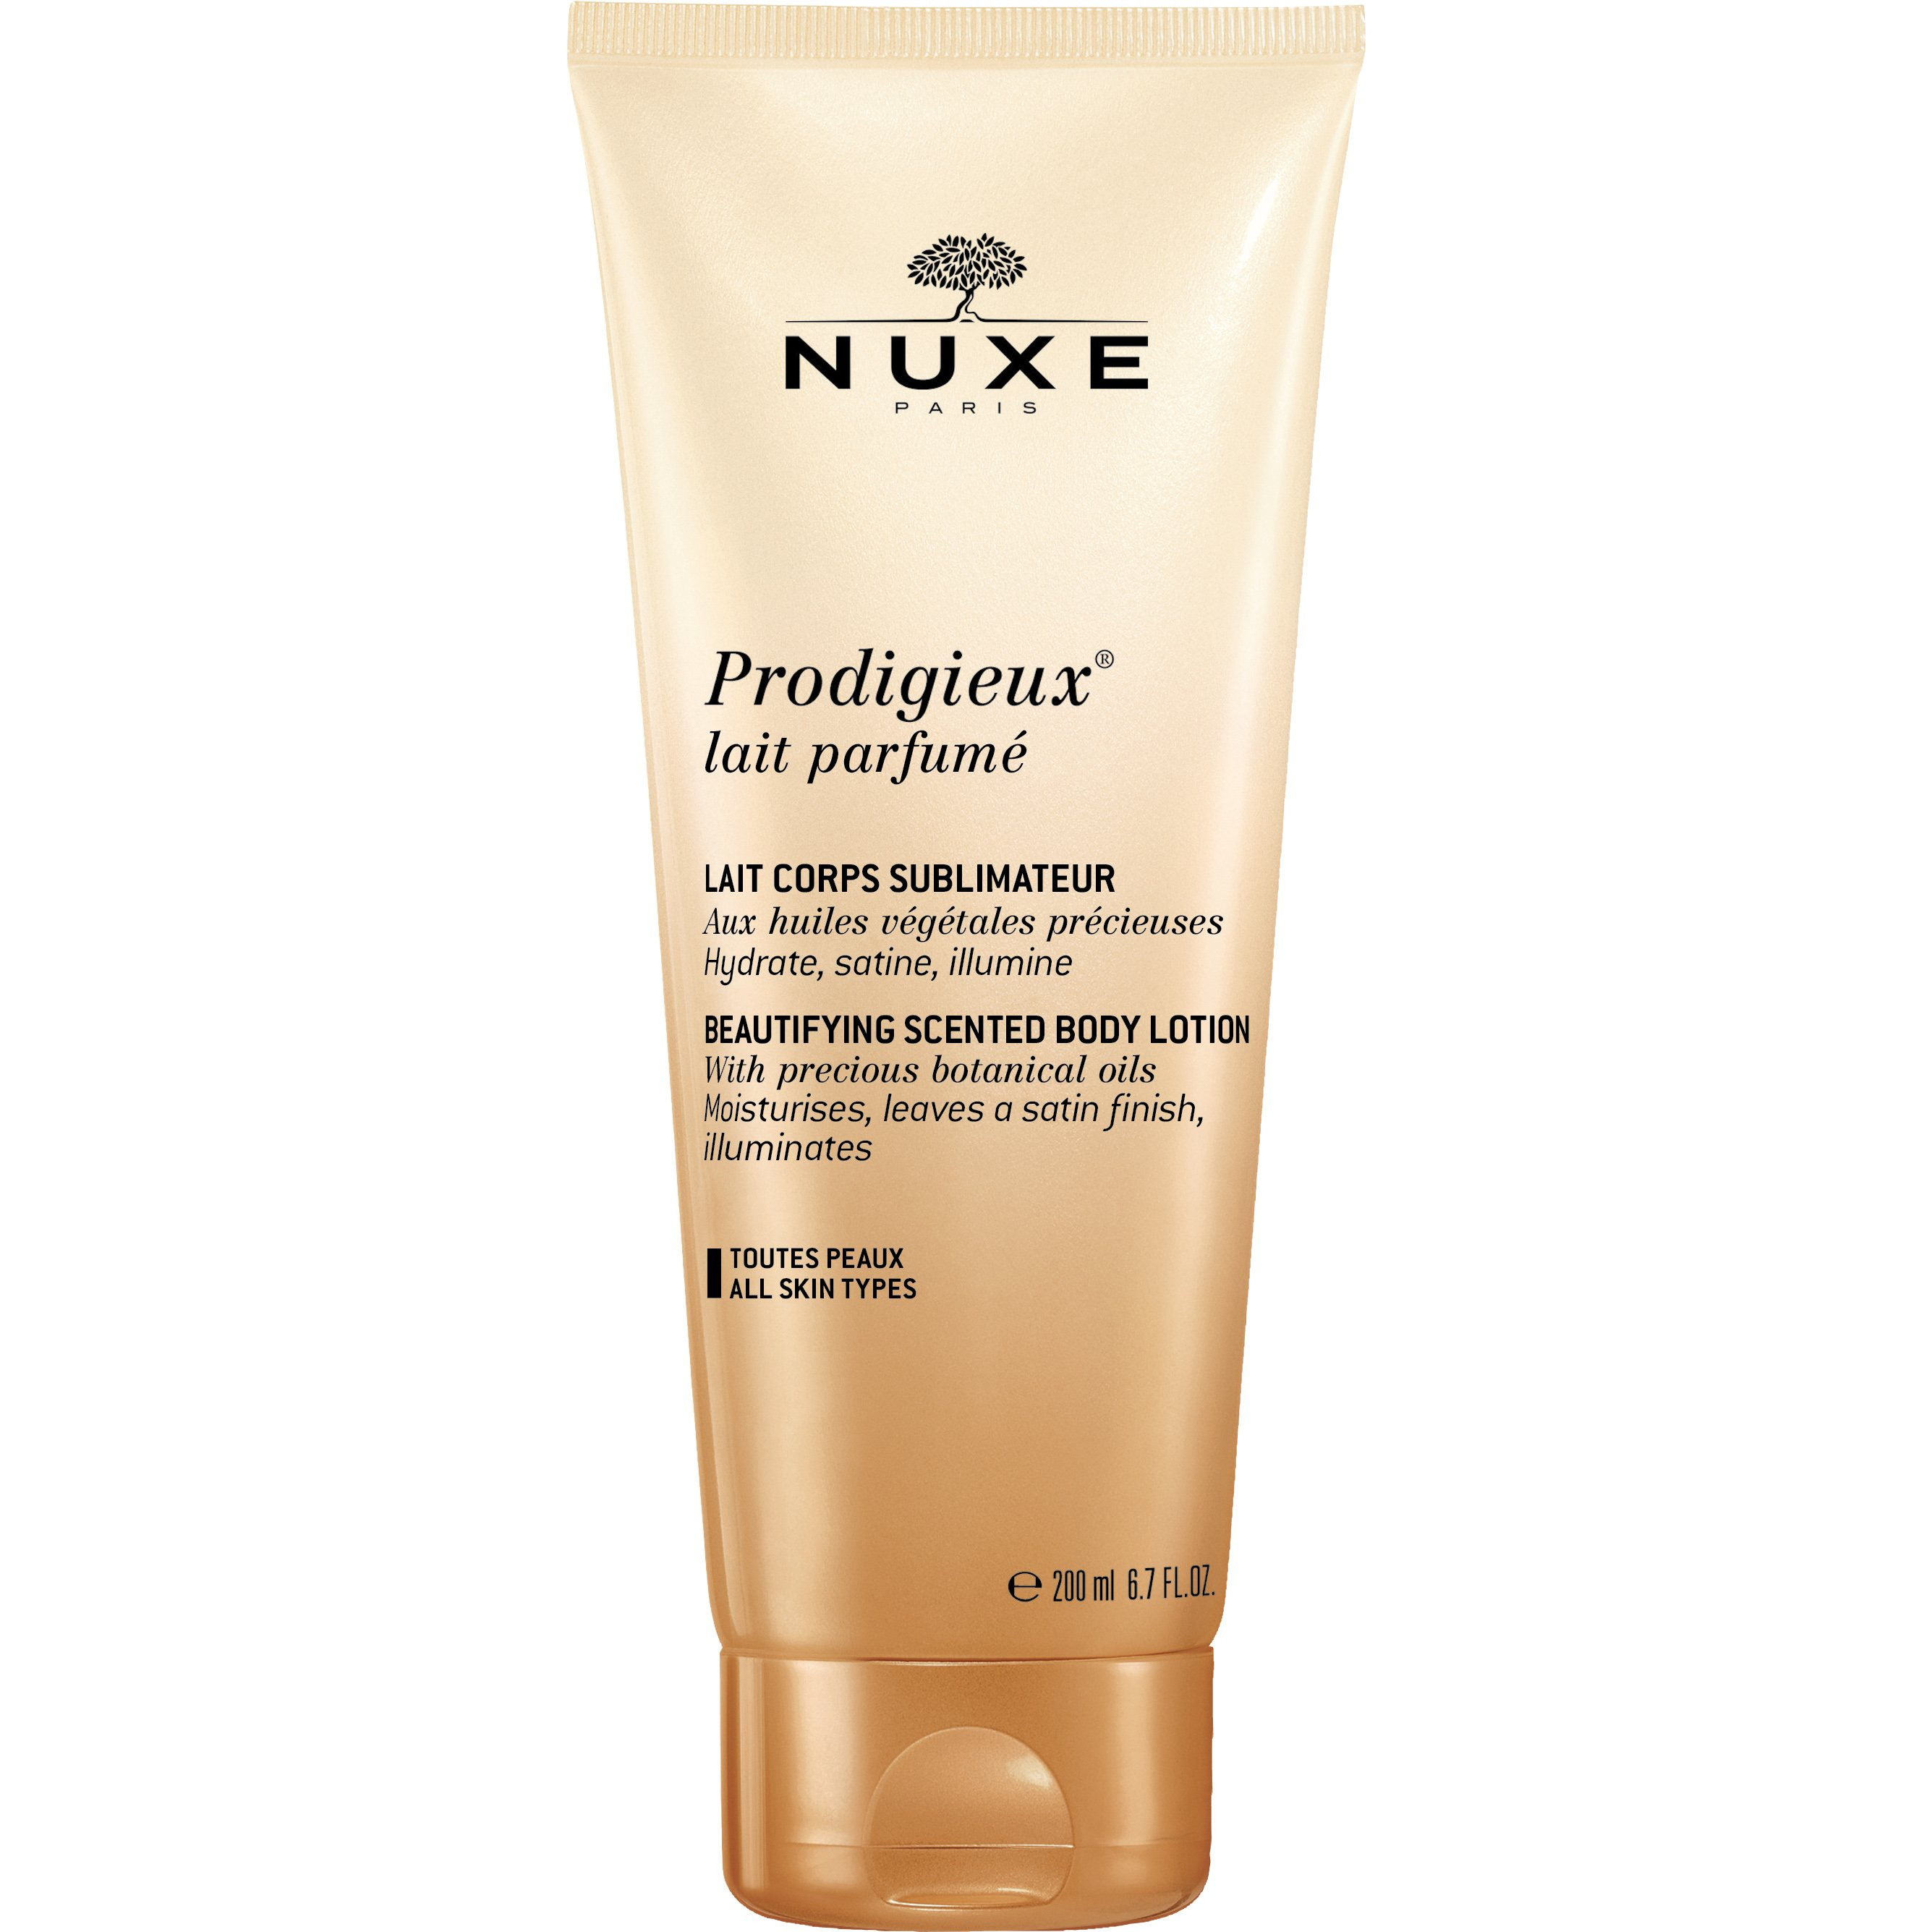 Nuxe Prodigieux Body Lotion Ενυδατώνει, Φωτίζει την Επιδερμίδα & Αφήνει ένα Σατινέ Φινίρισμα, με Πολύτιμα Βοτανικά Έλαια 200ml